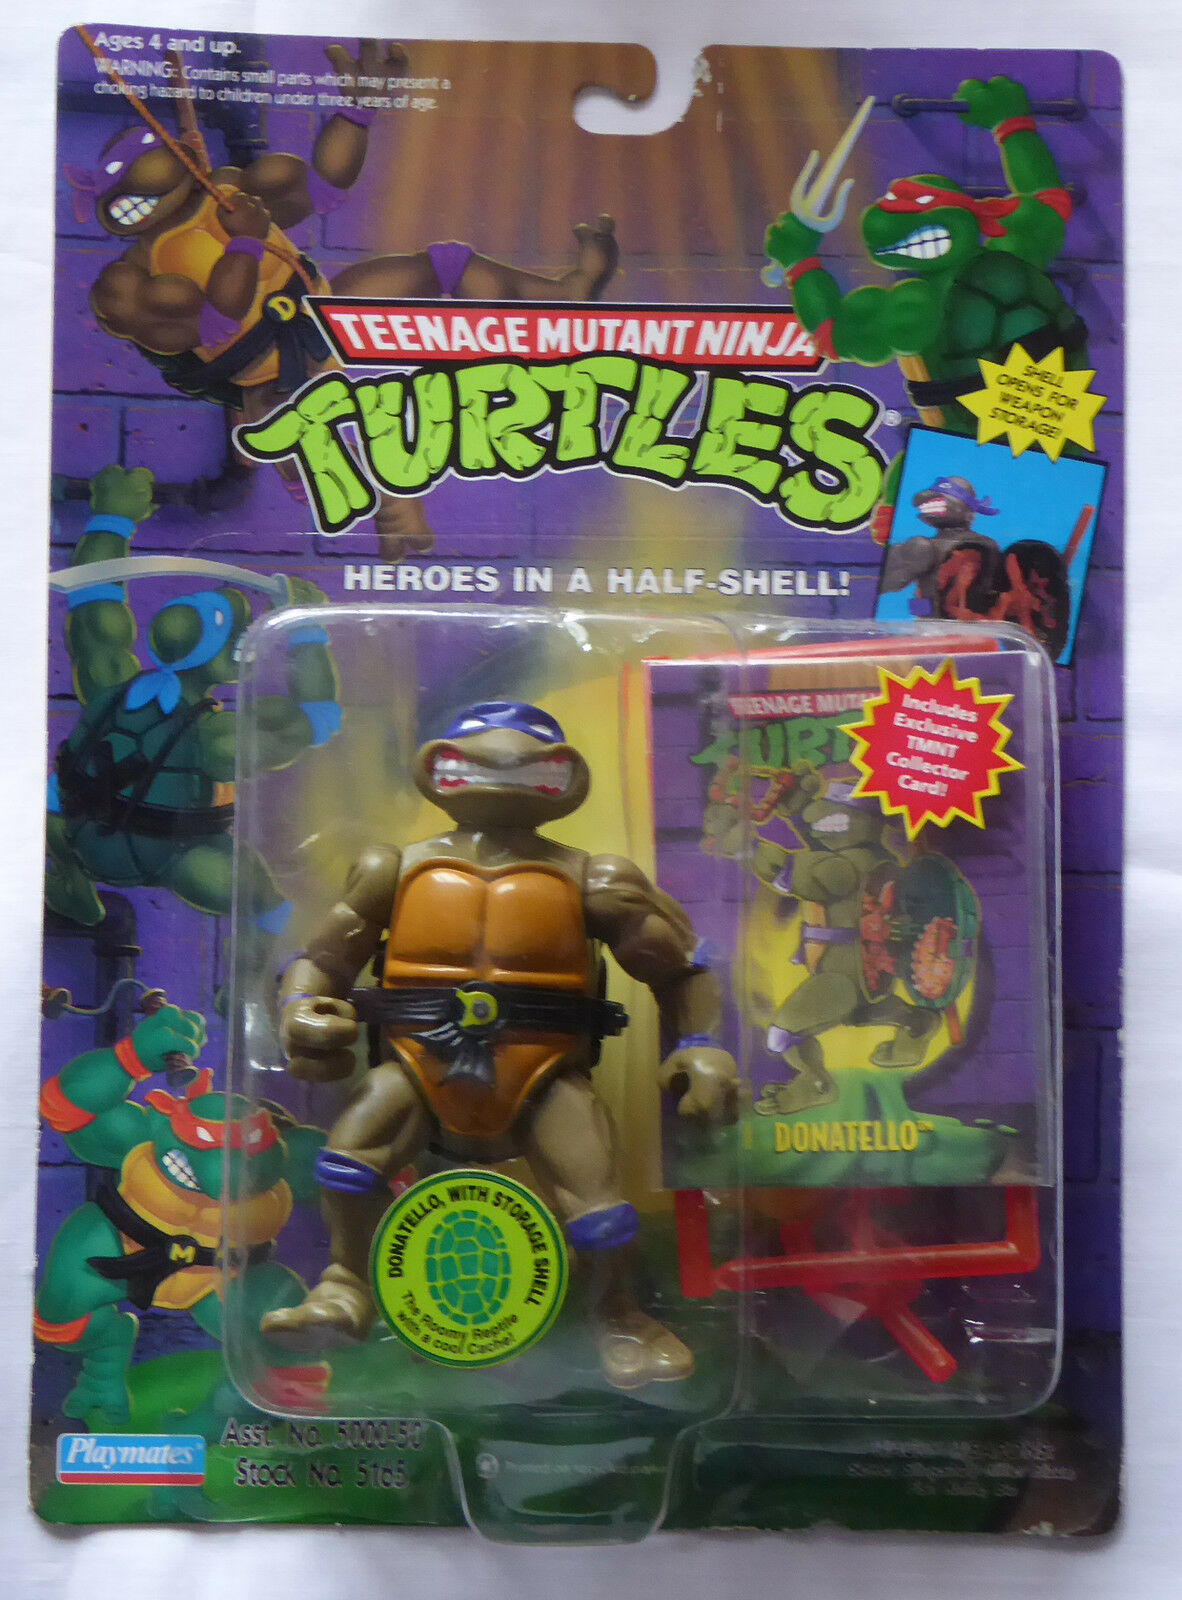 1991 TMNT Turtles figure Storage Shell Donatello - MISB (1994 version)